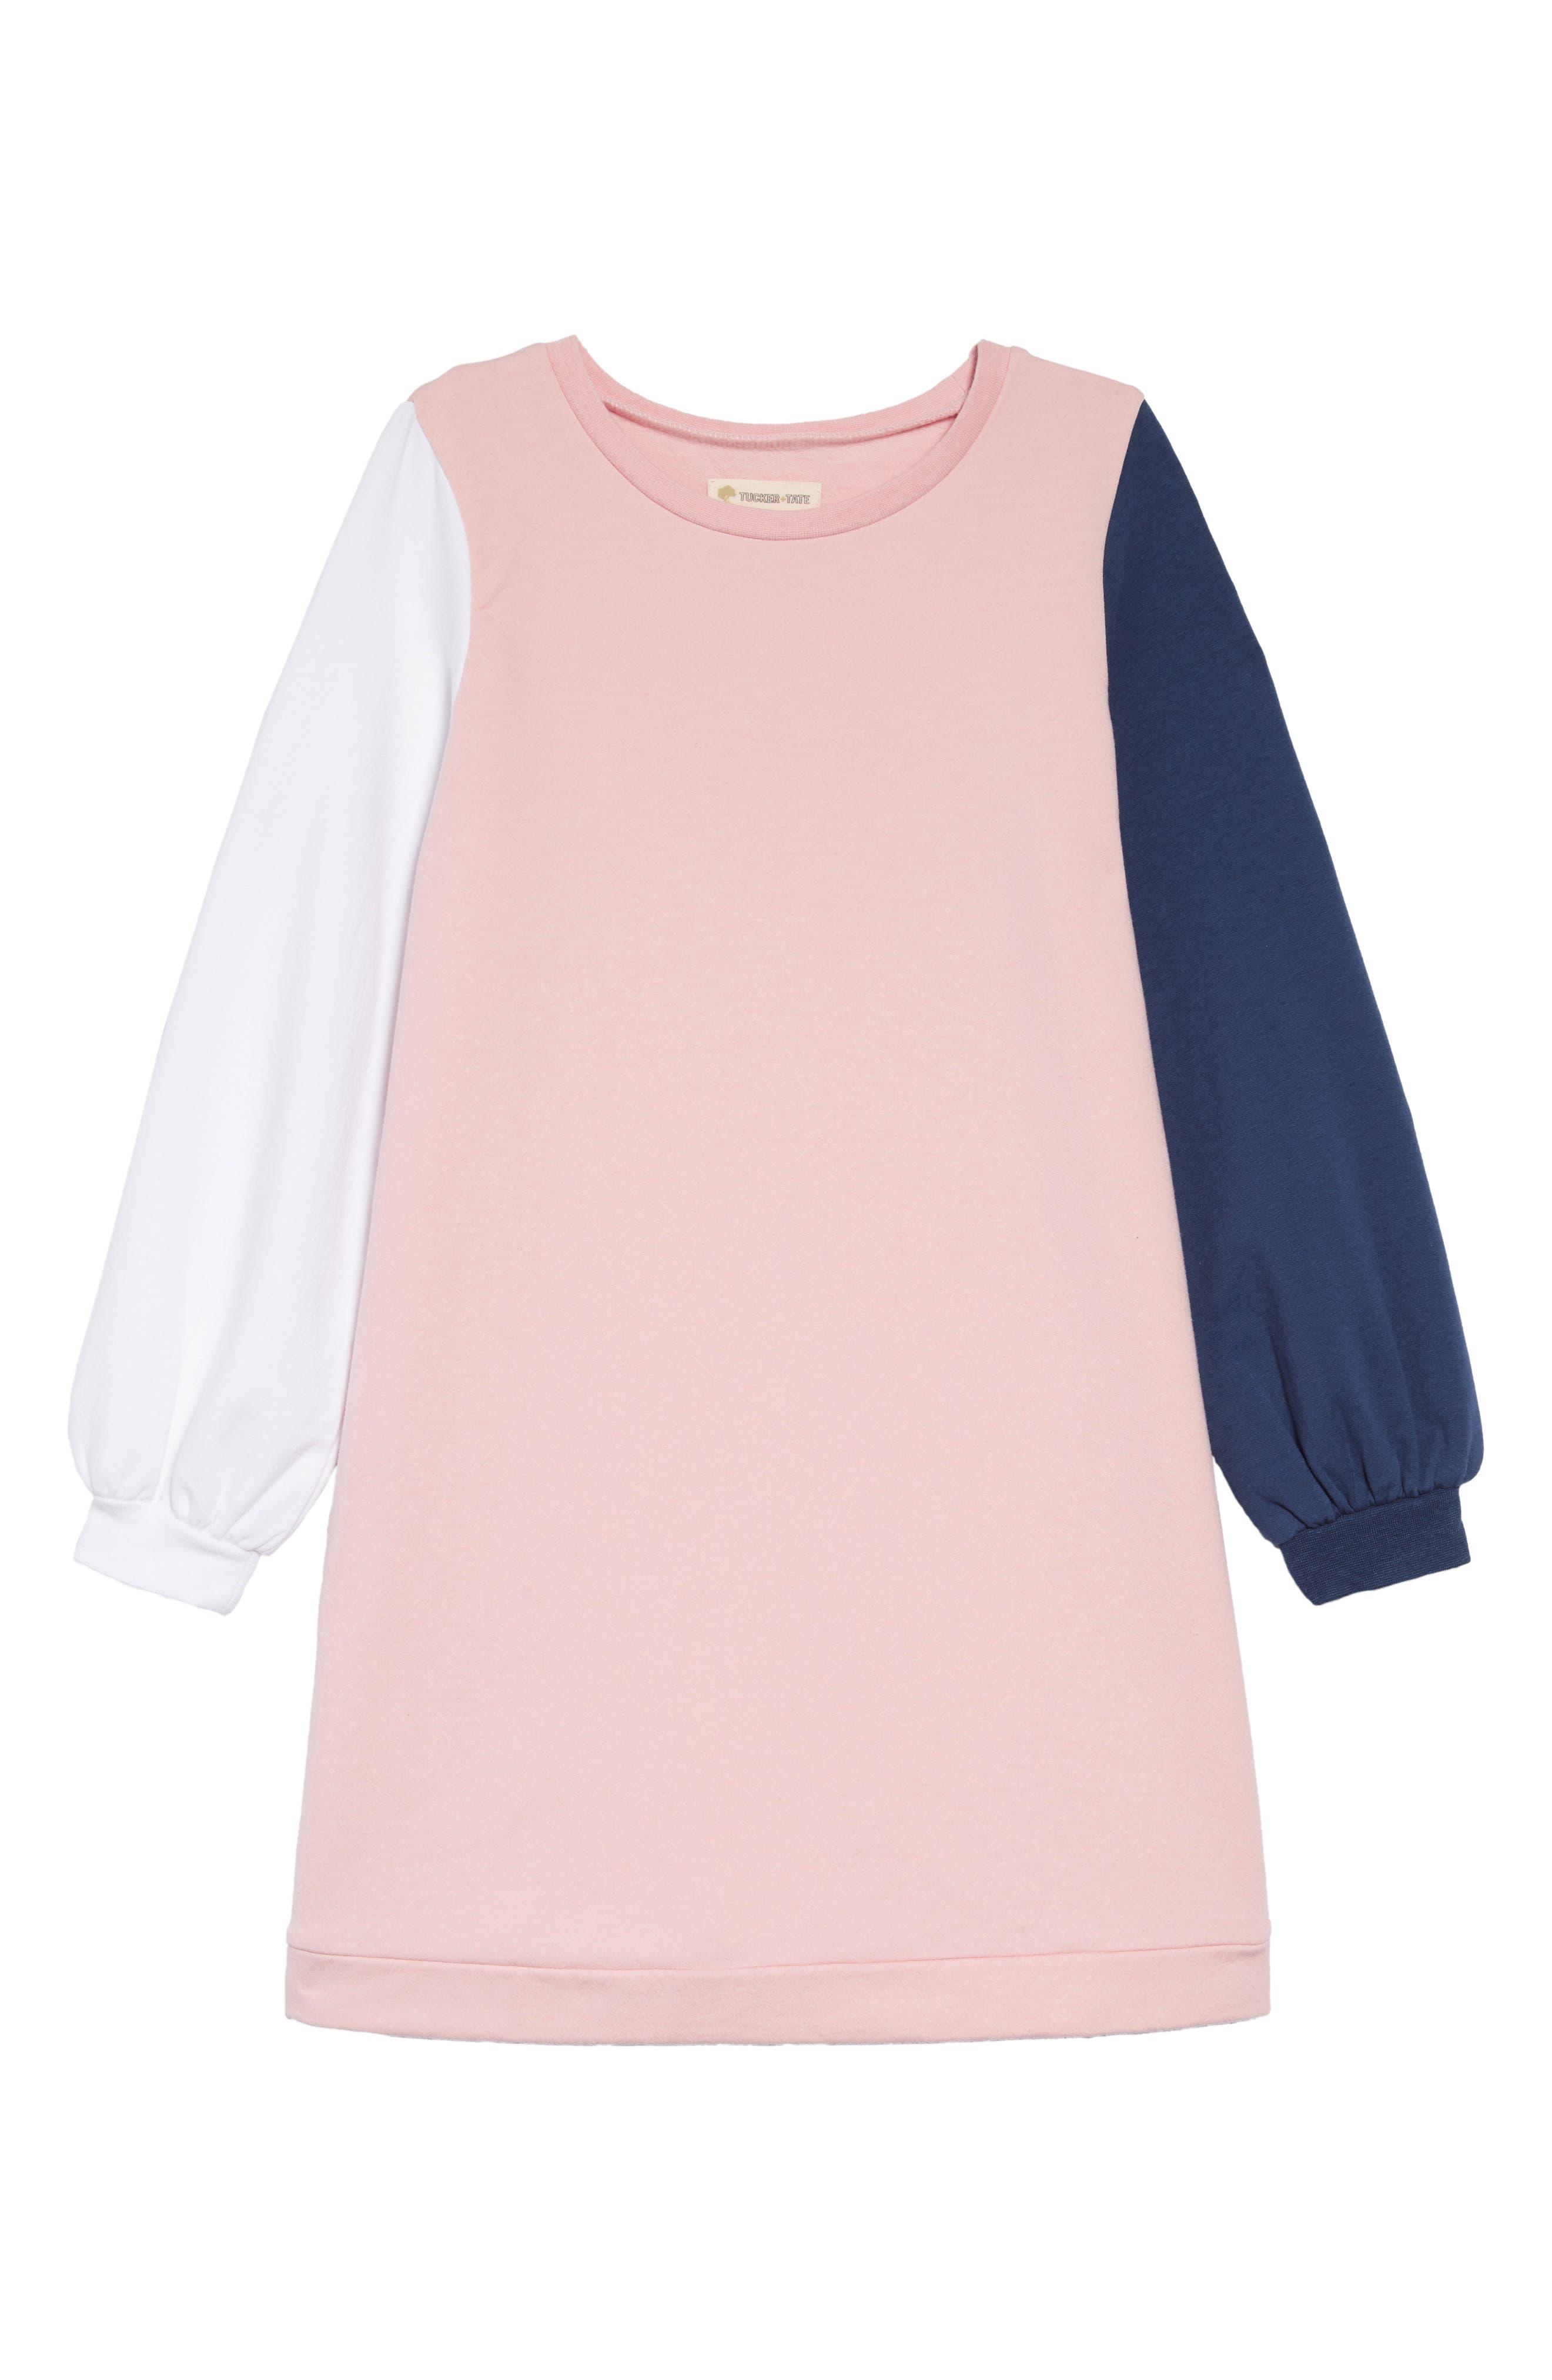 TUCKER + TATE, Colorblock Fleece Dress, Main thumbnail 1, color, 680